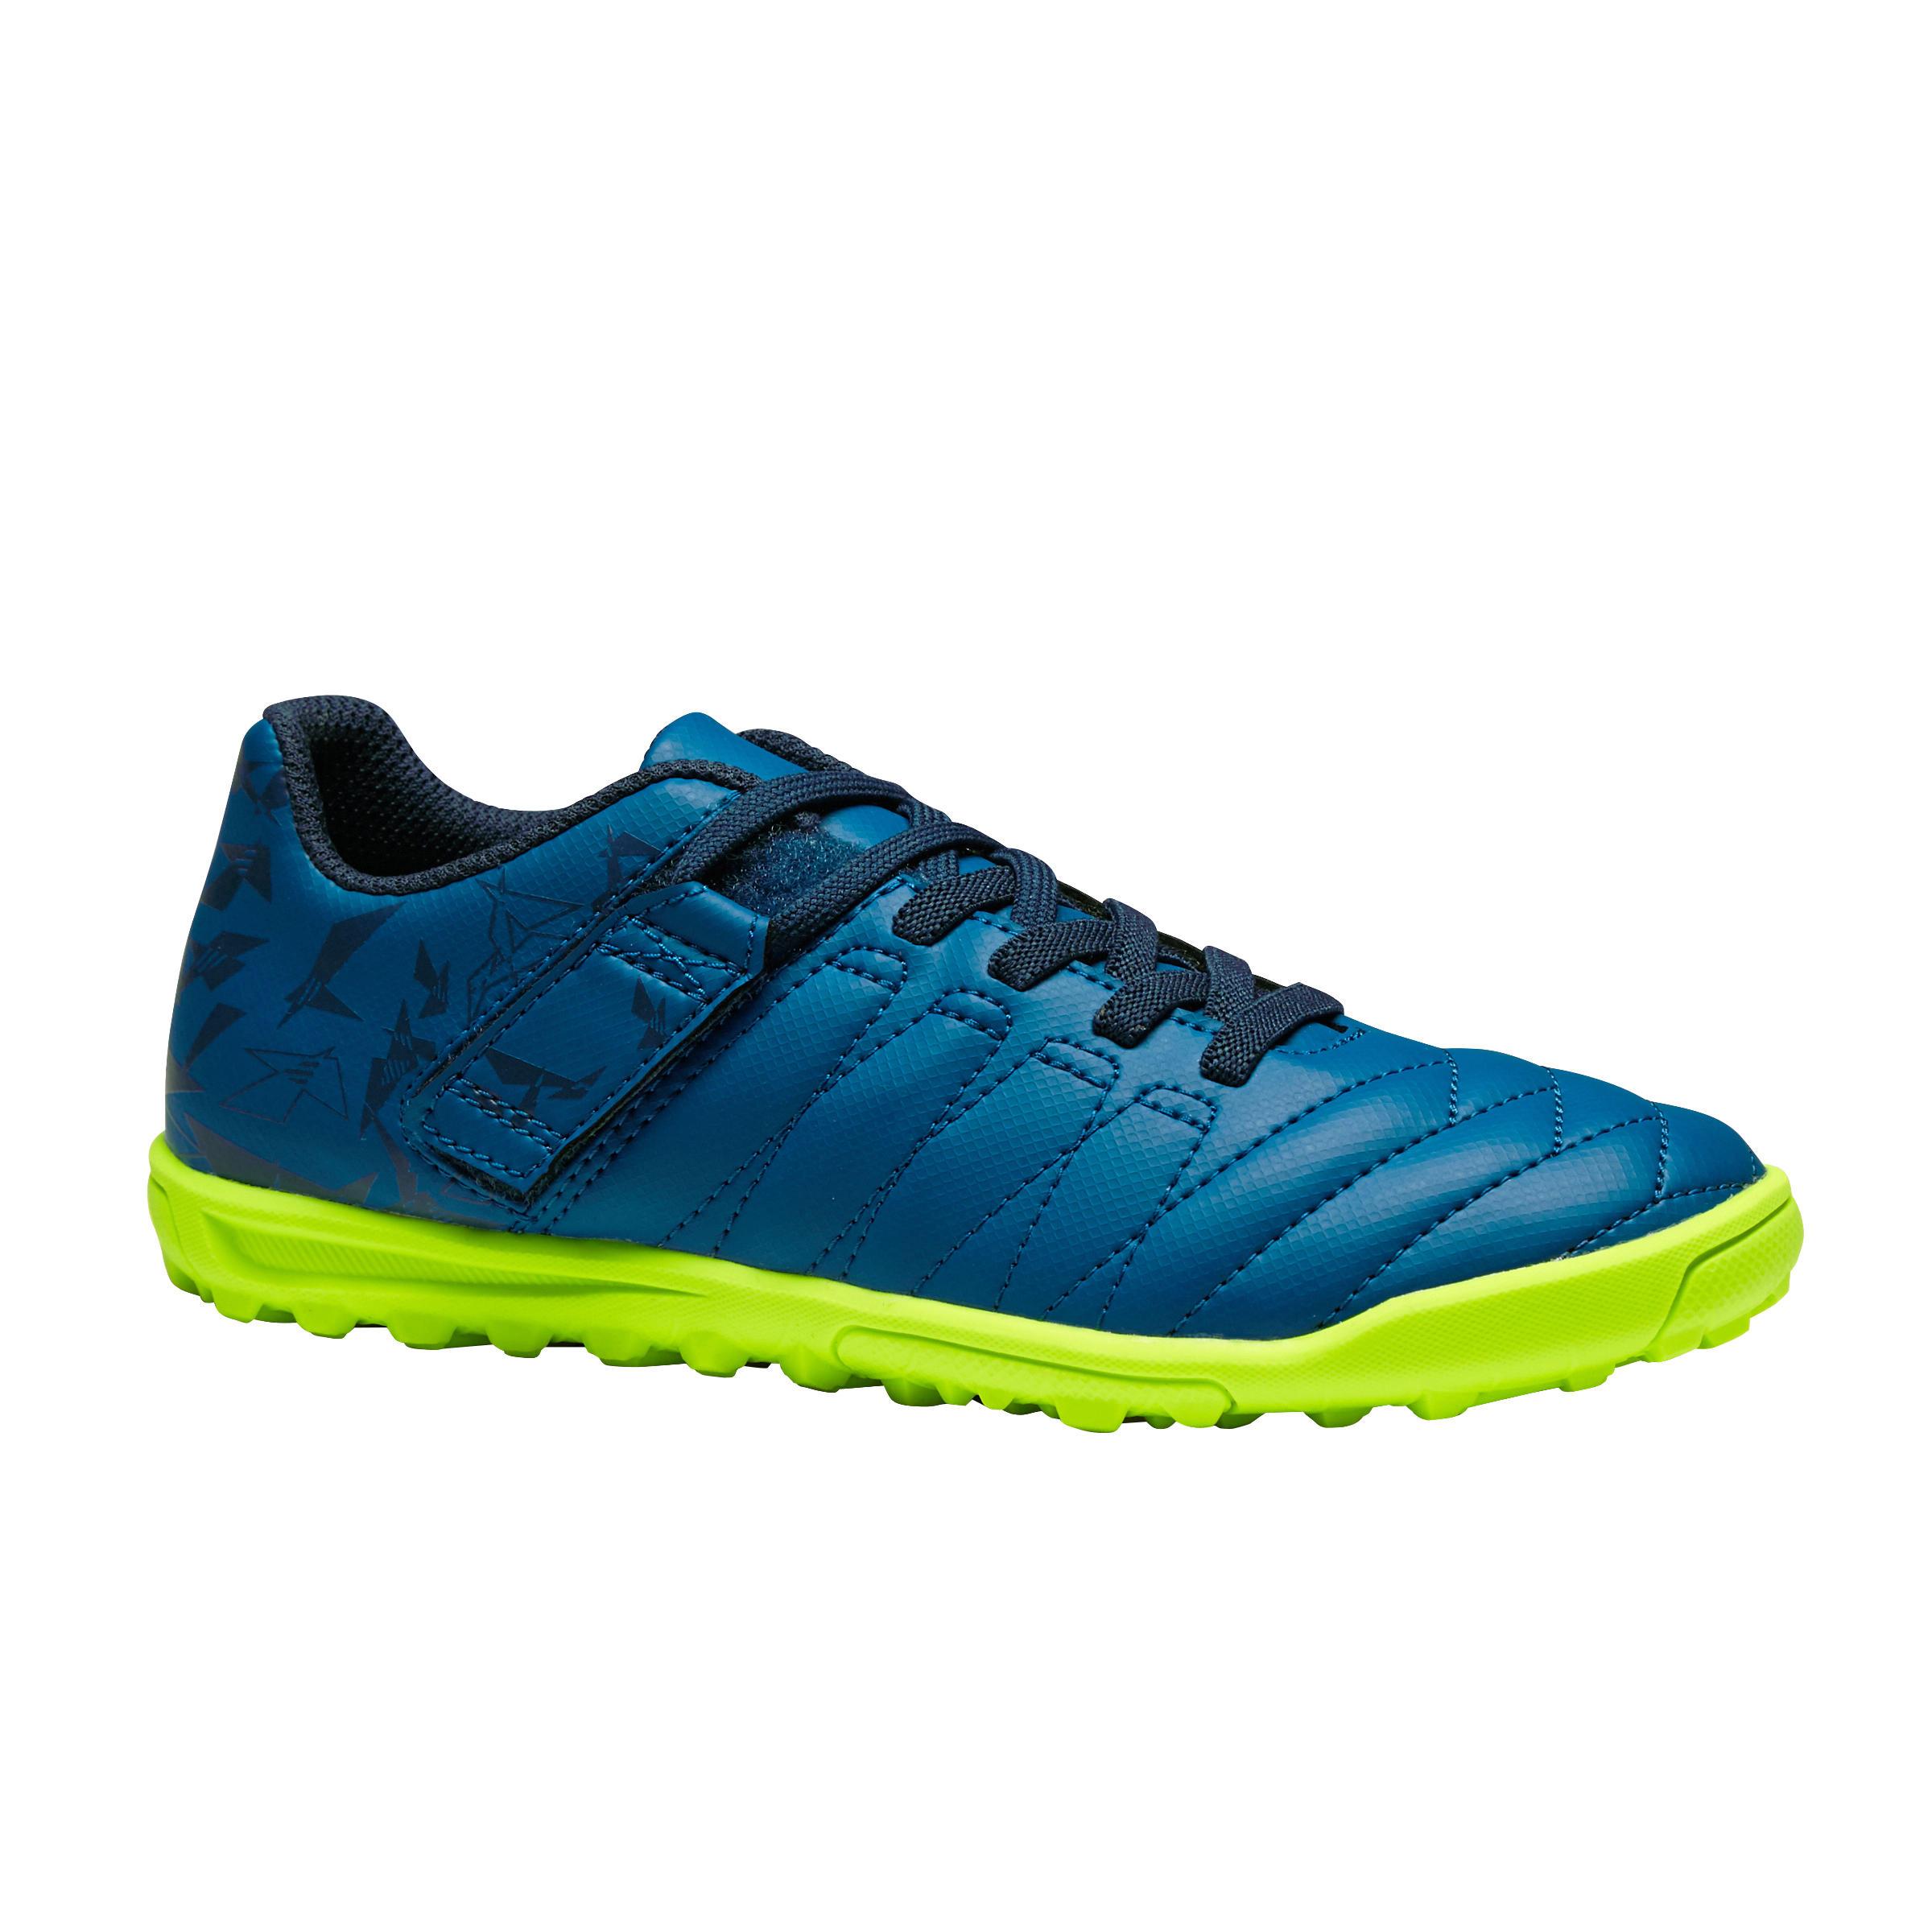 Kipsta Voetbalschoenen kind Agility 300 HG klittenband blauw/groen